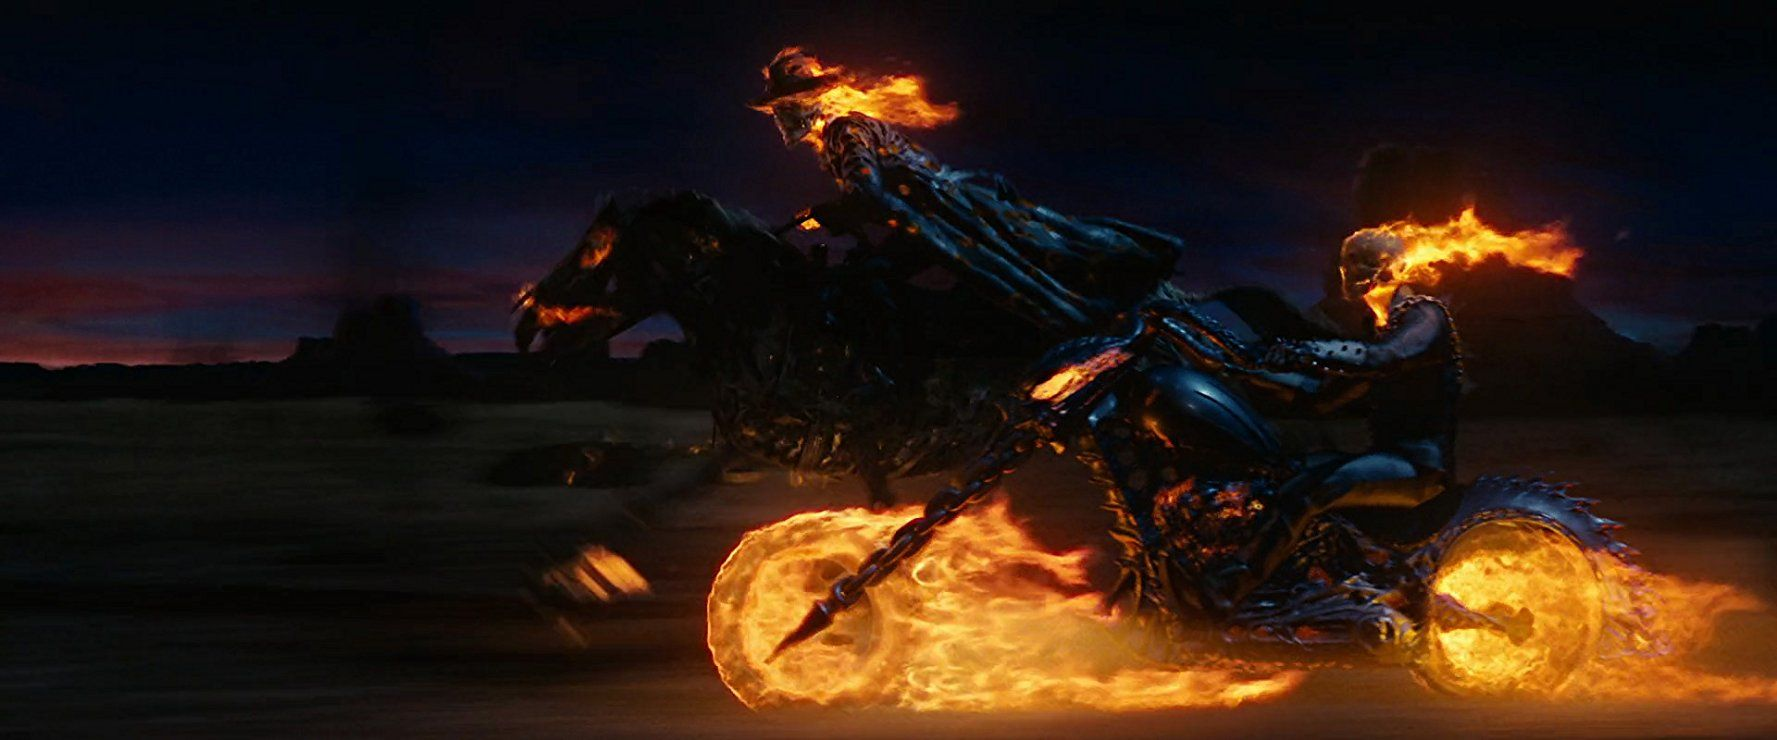 Ghost Rider (2007) - Photo Gallery - IMDb